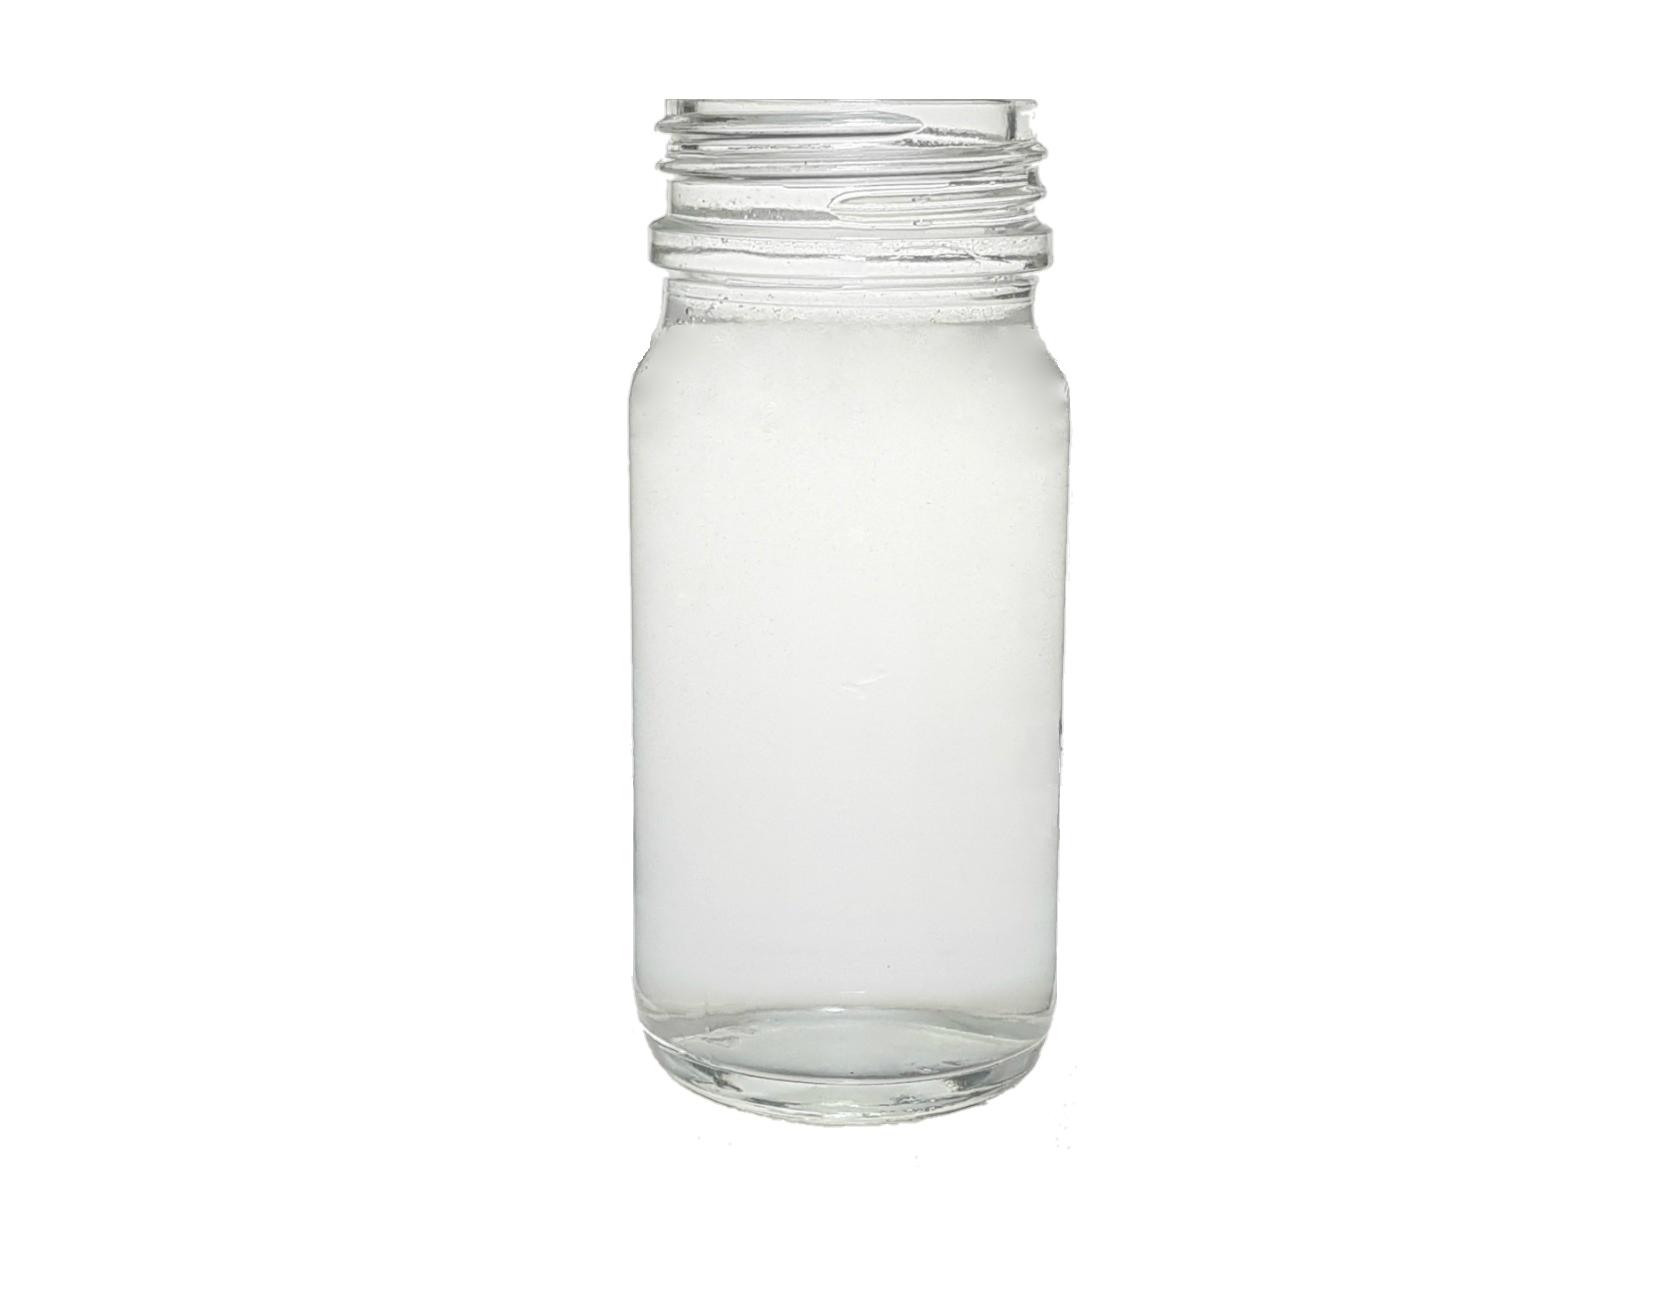 WIDE MOUTH CLEAR GLASS 120 ML KOLA BOTTLE PH 30